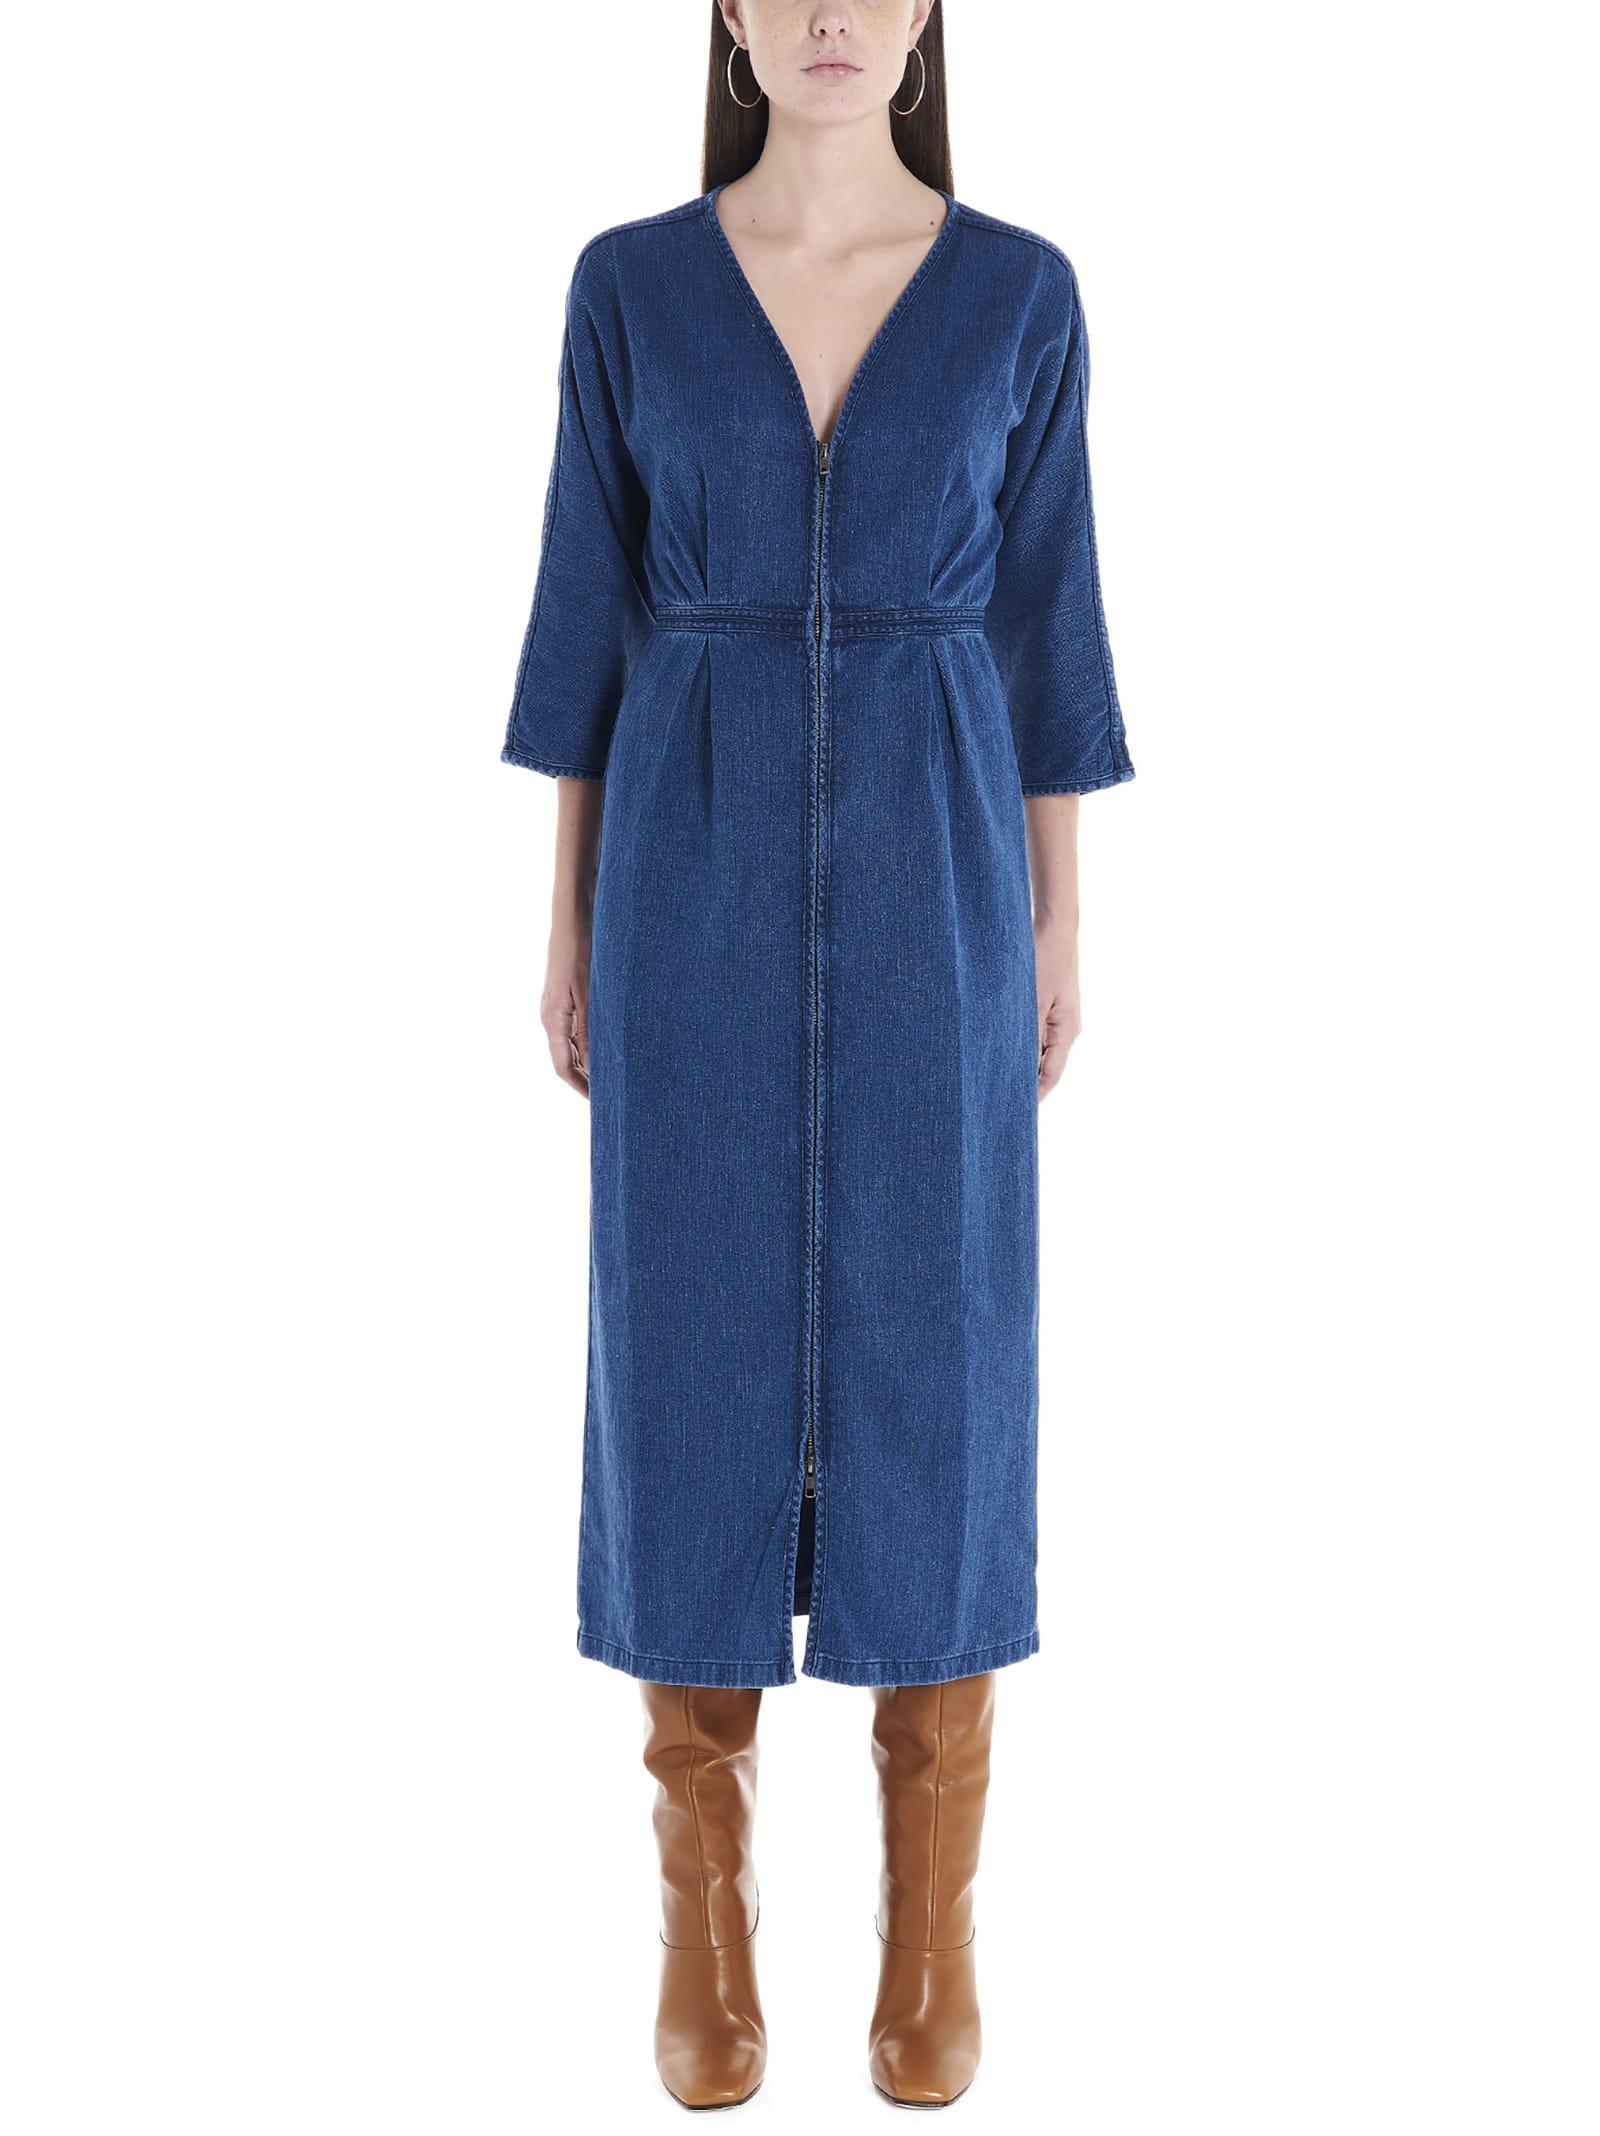 Mara Hoffman Dresses DRESS